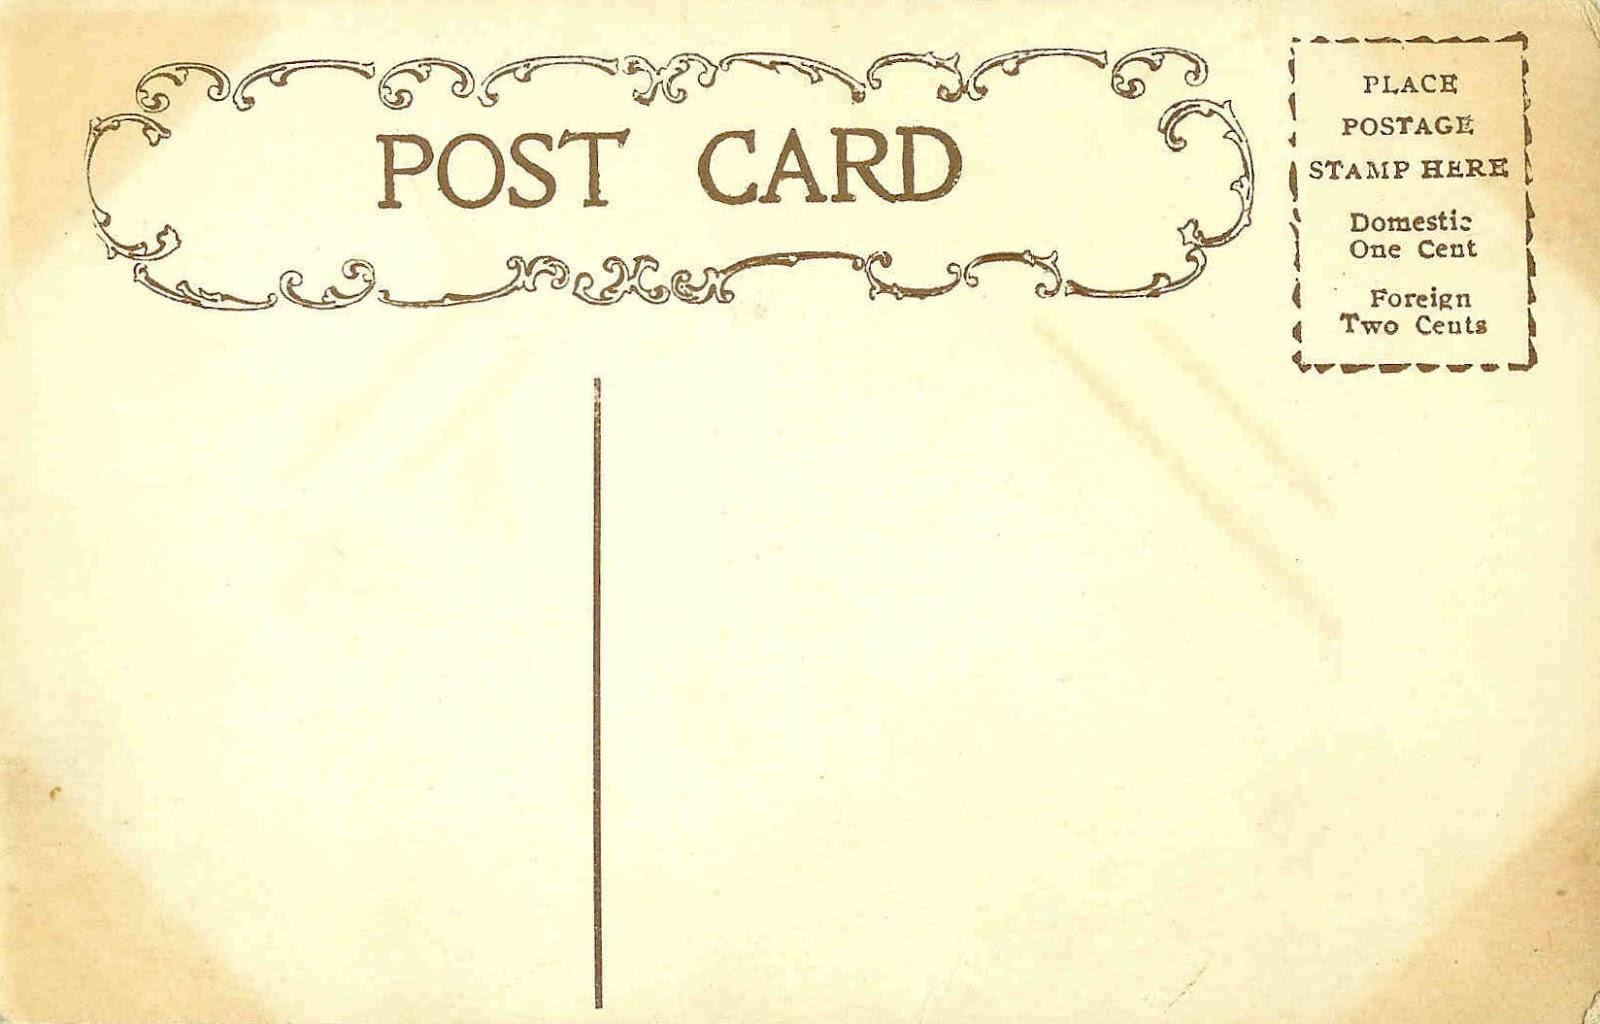 http://4.bp.blogspot.com/-GY_RytMqV4A/UK6Pf-wCUZI/AAAAAAAAHMo/6sV98oTwIR0/s1600/1910postcardback01.jpg